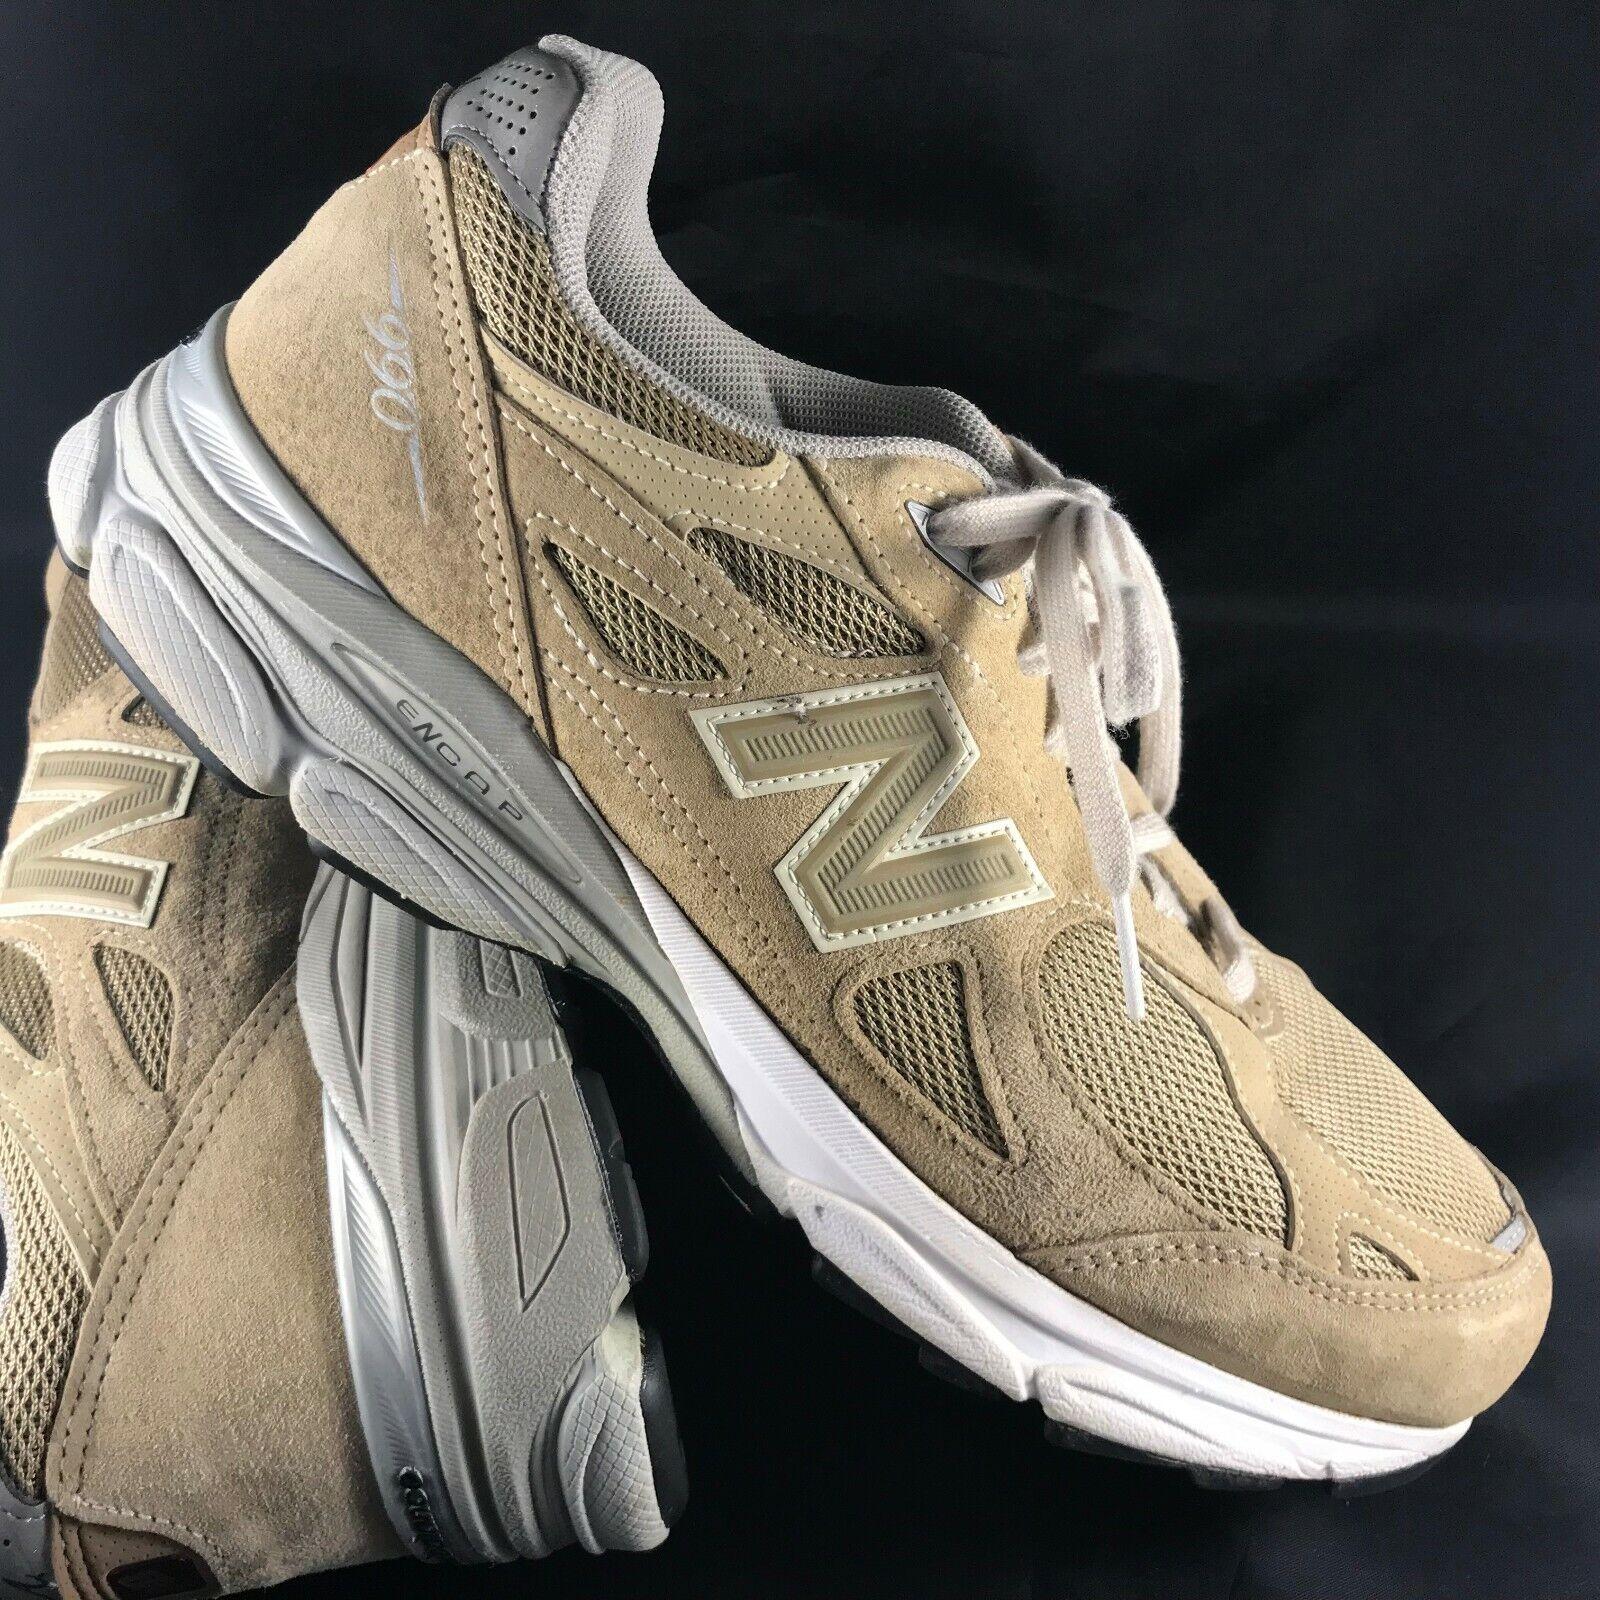 New Balance 990 Version 3 Men Khaki Tan Suede Sneakers Size 10 (4E) Extra Wide